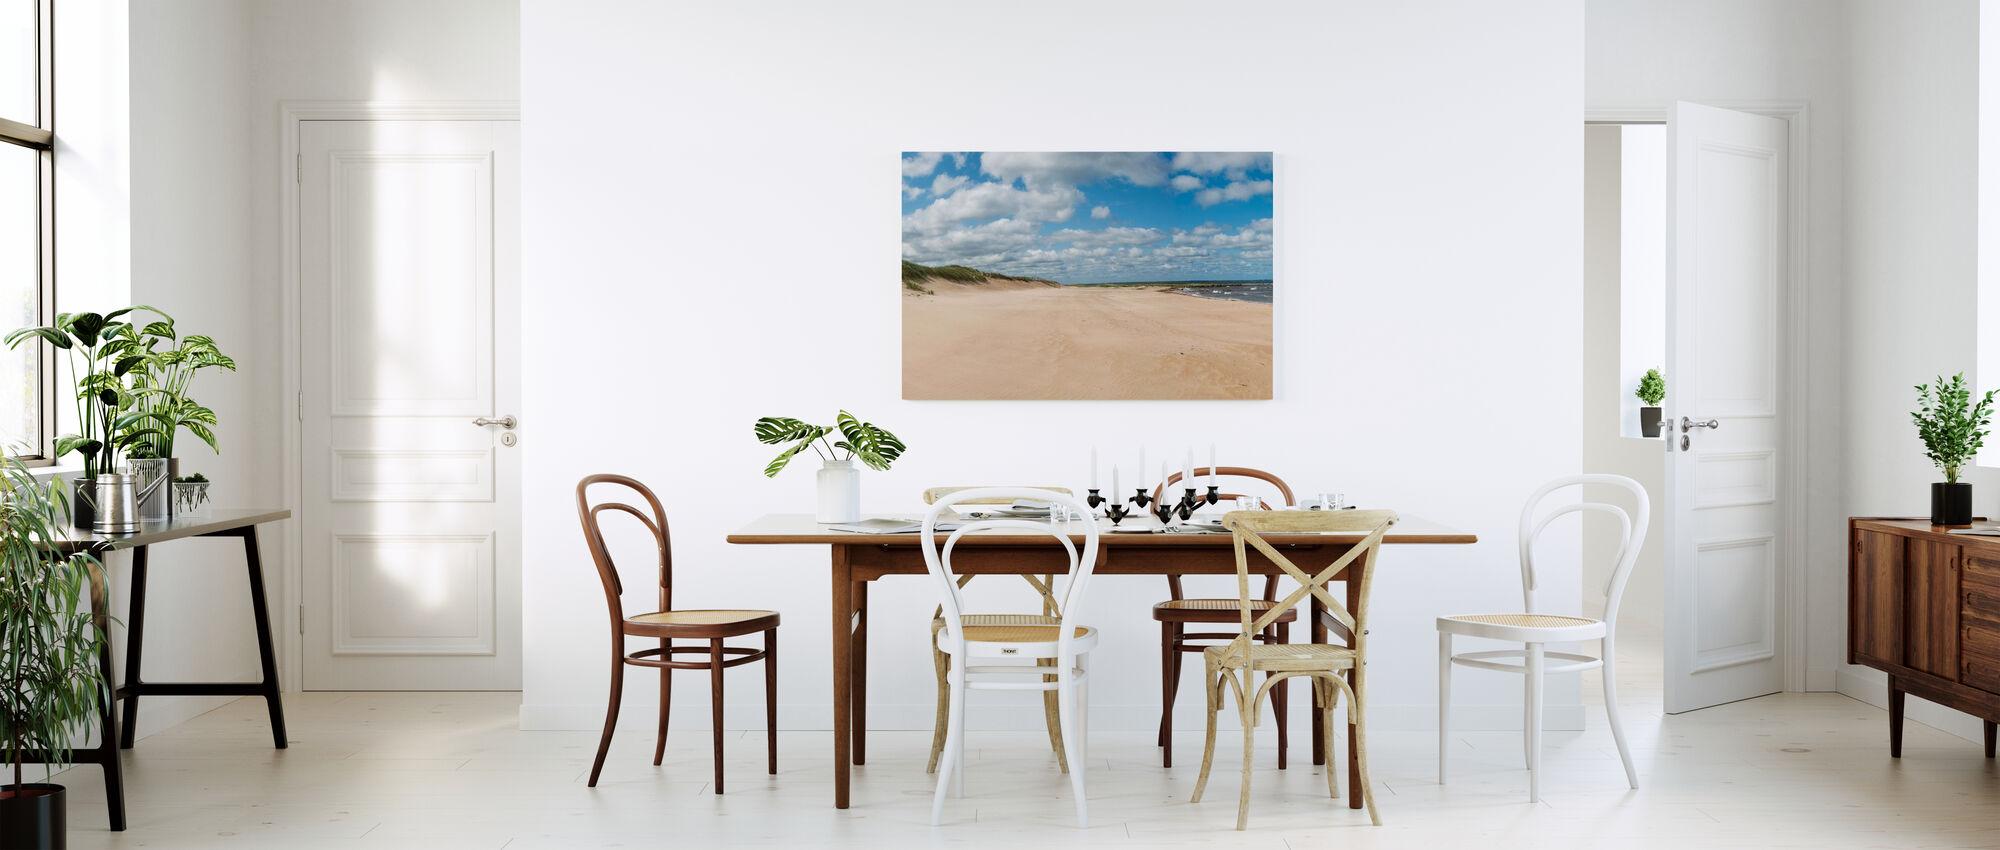 Vejbystrand in Skåne, Zweden - Canvas print - Keuken